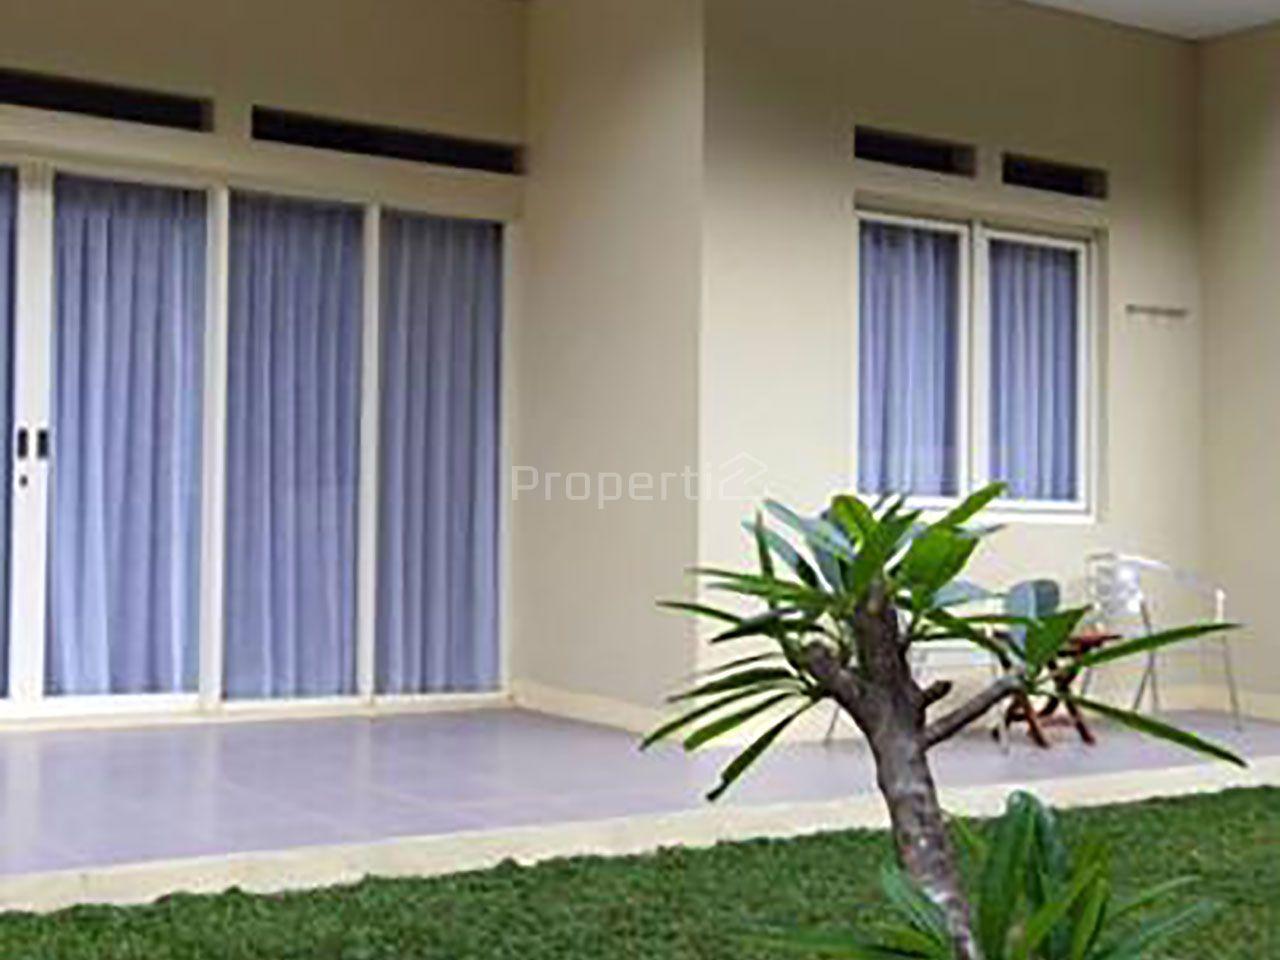 Rumah Baru di Resor Dago Pakar, Kab. Bandung